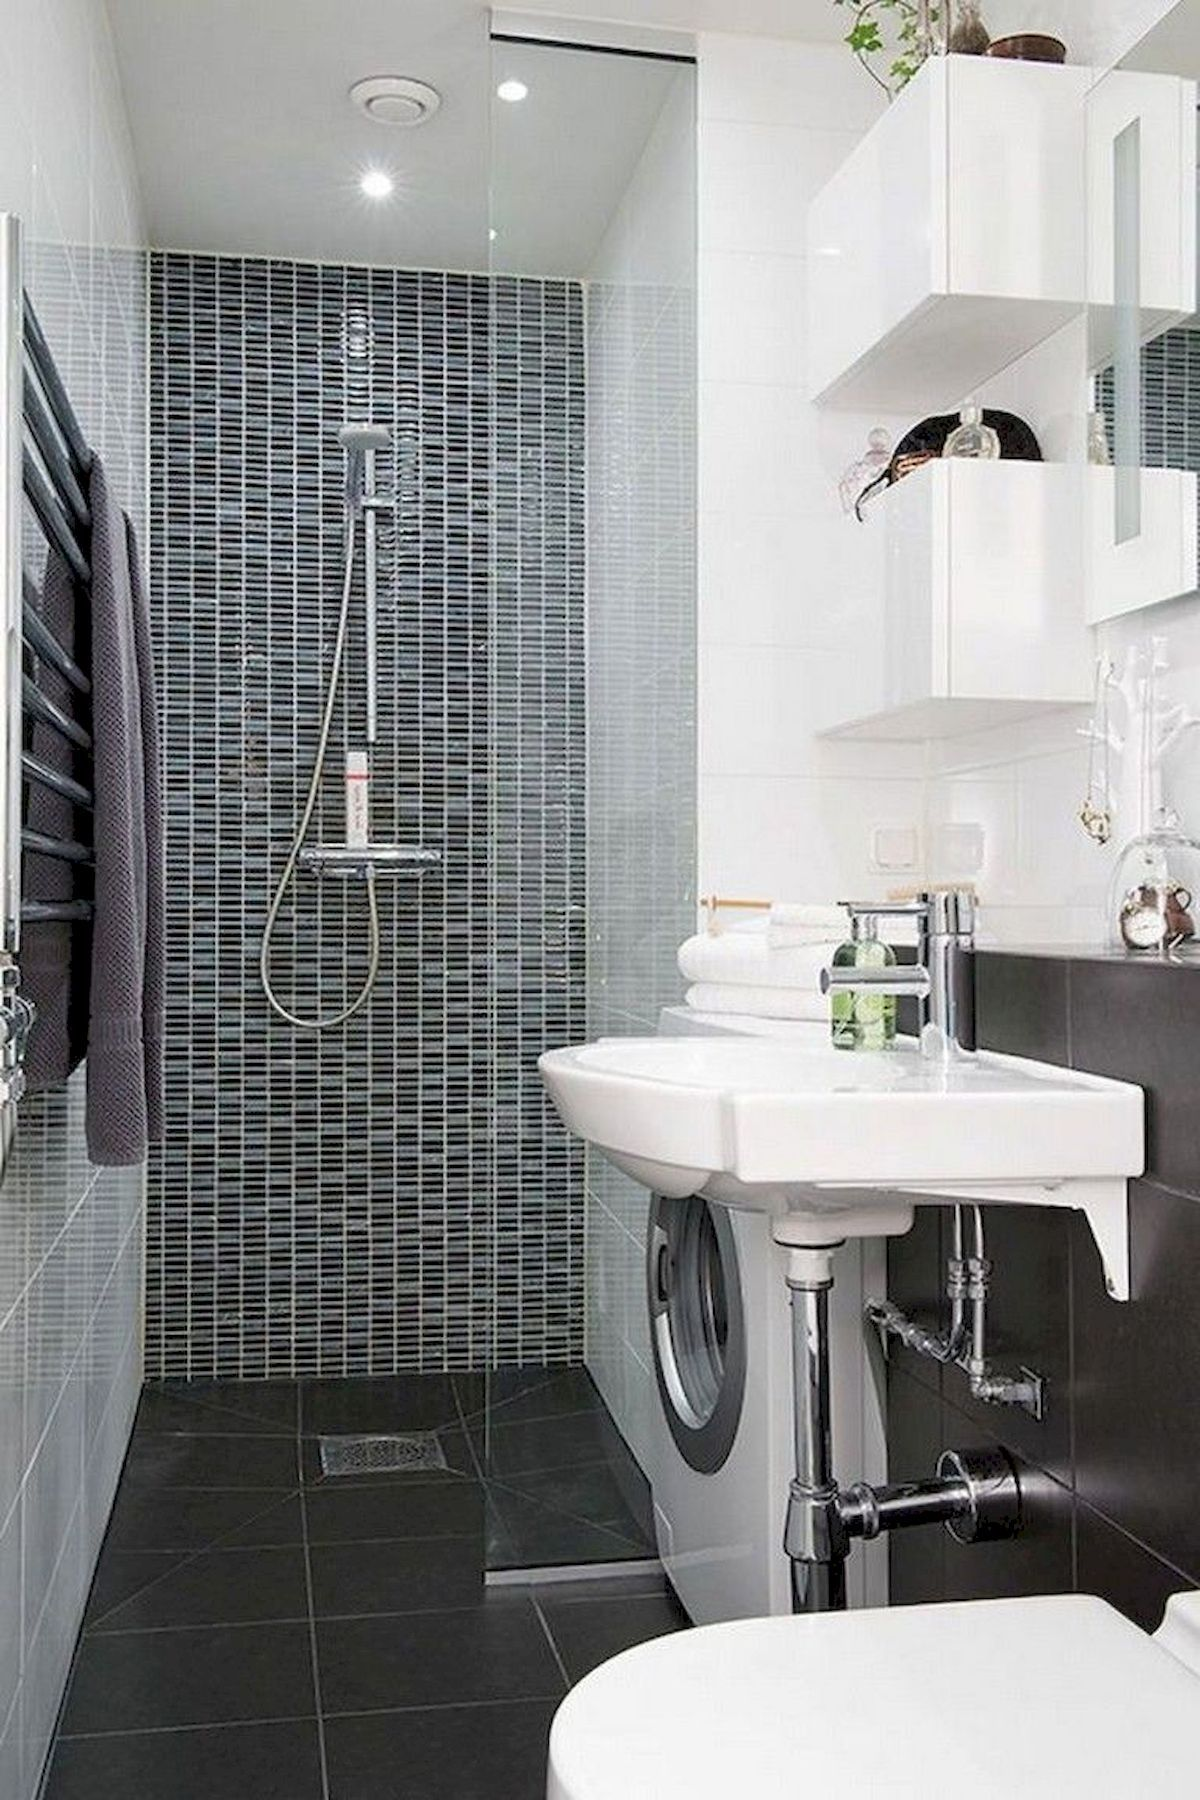 30 stunning small bathroom ideas on a budget small on bathroom renovation ideas on a budget id=52383